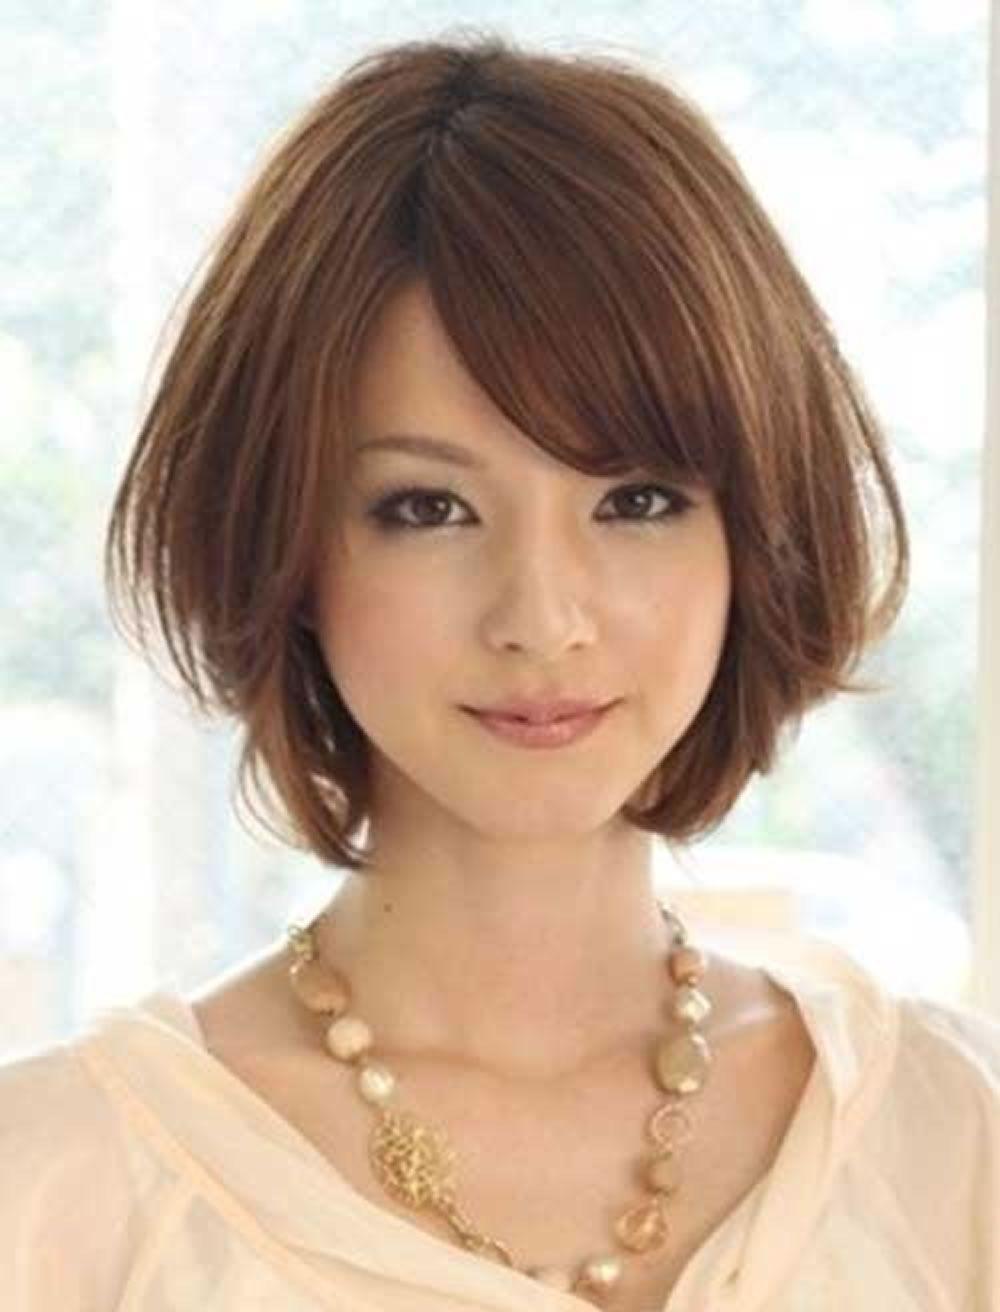 Short Hairstyles For Asian Women 2018 2019 In 2019 | Hair Cuts regarding Asian Short Hairstyle Female